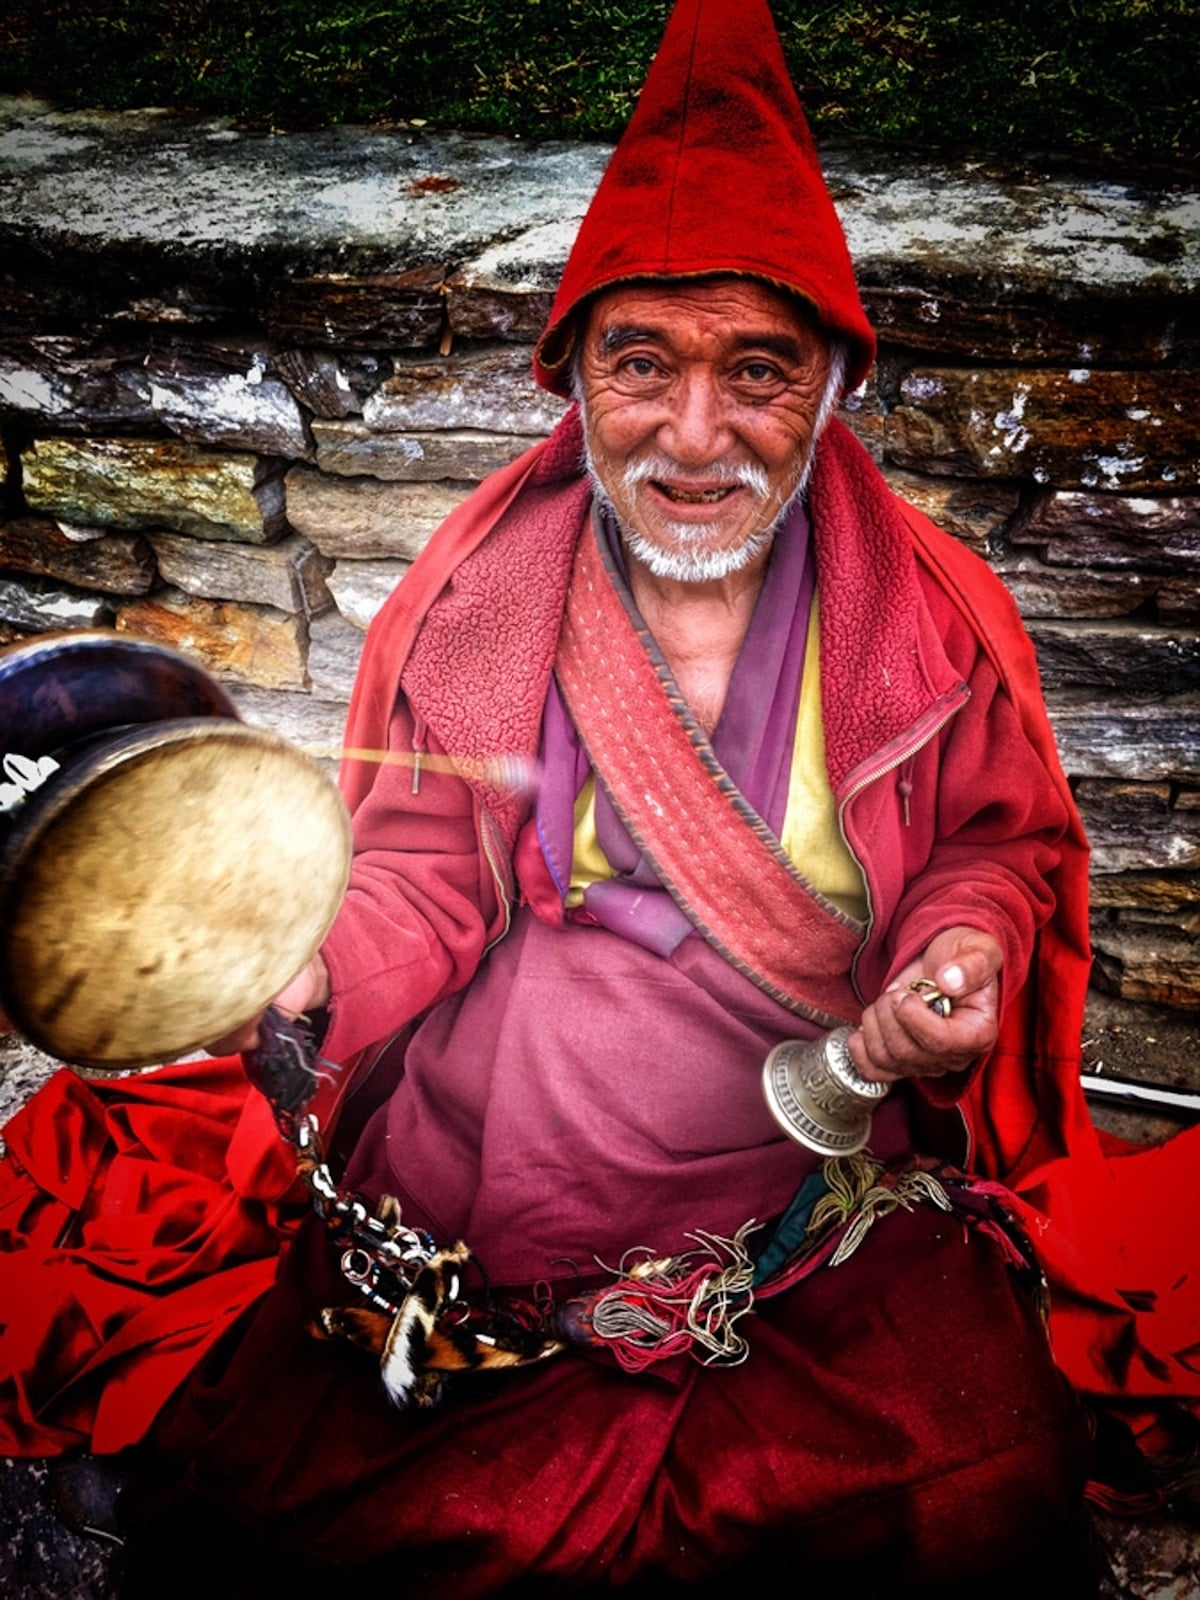 tim hieu van hoa truyen thong phong phu va le hoi linh thieng cua bhutan